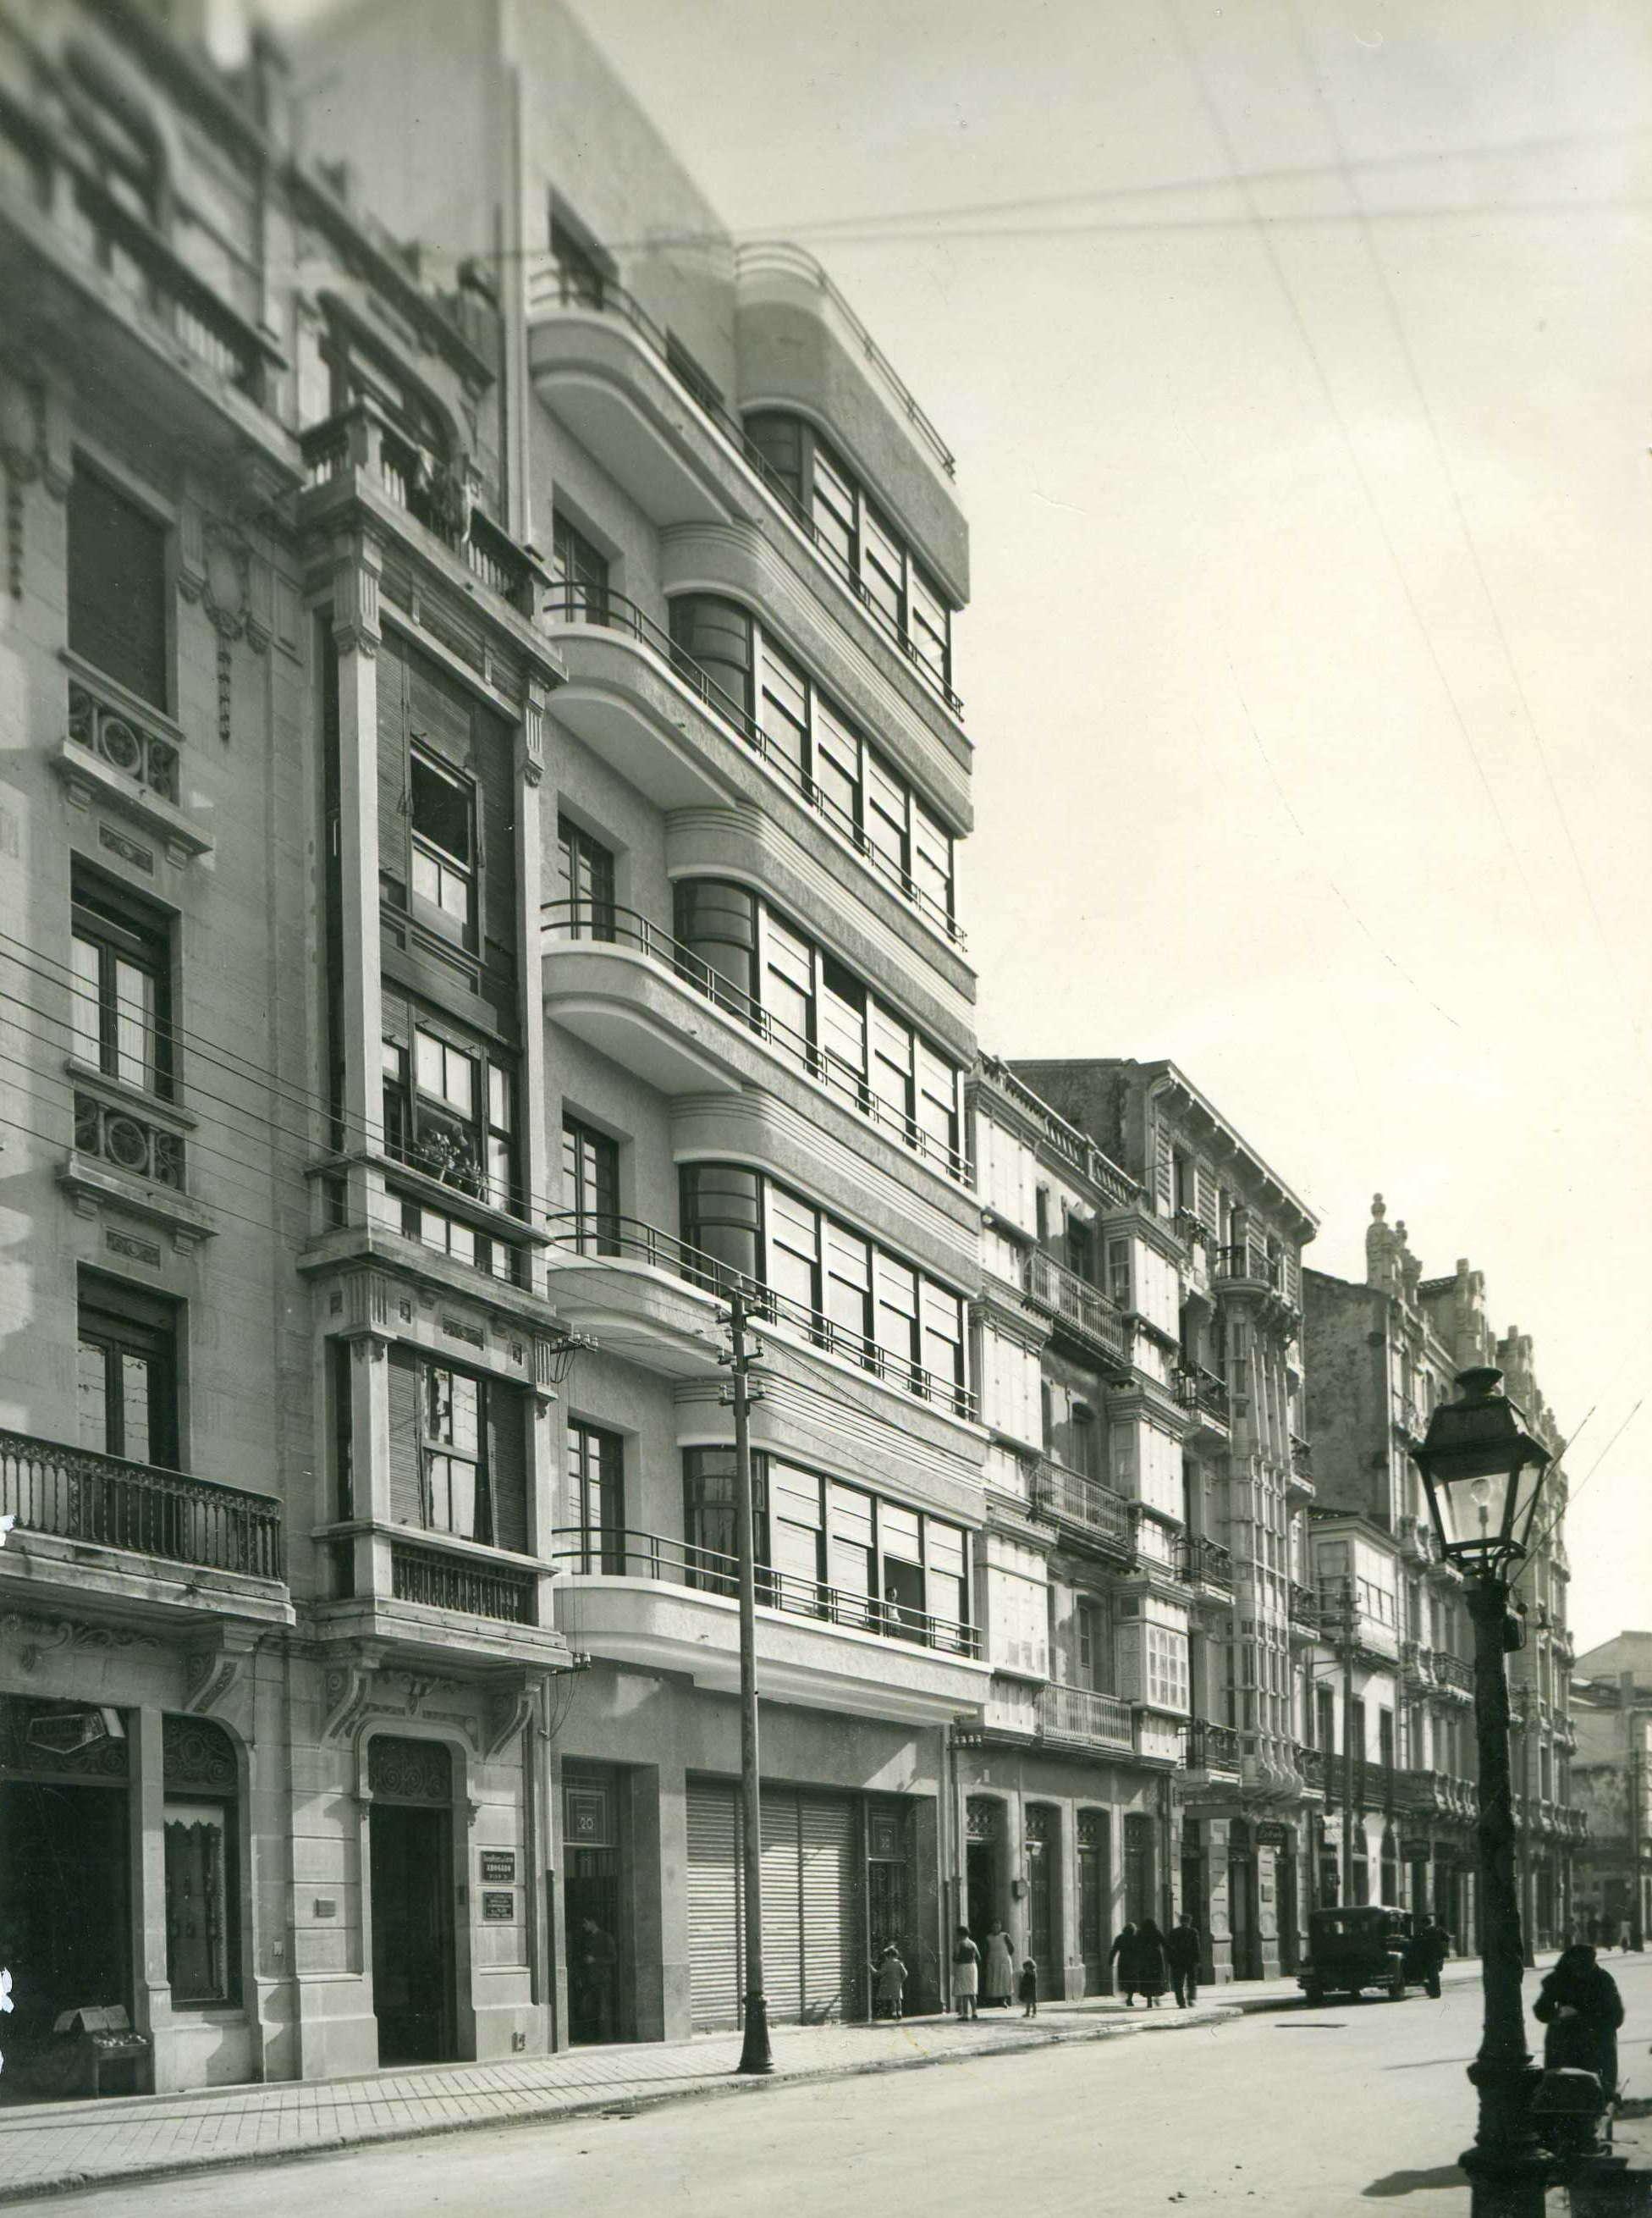 Rehabilitación de vivienda racionalista de Tenreiro y Estellés de 1933. A Coruña